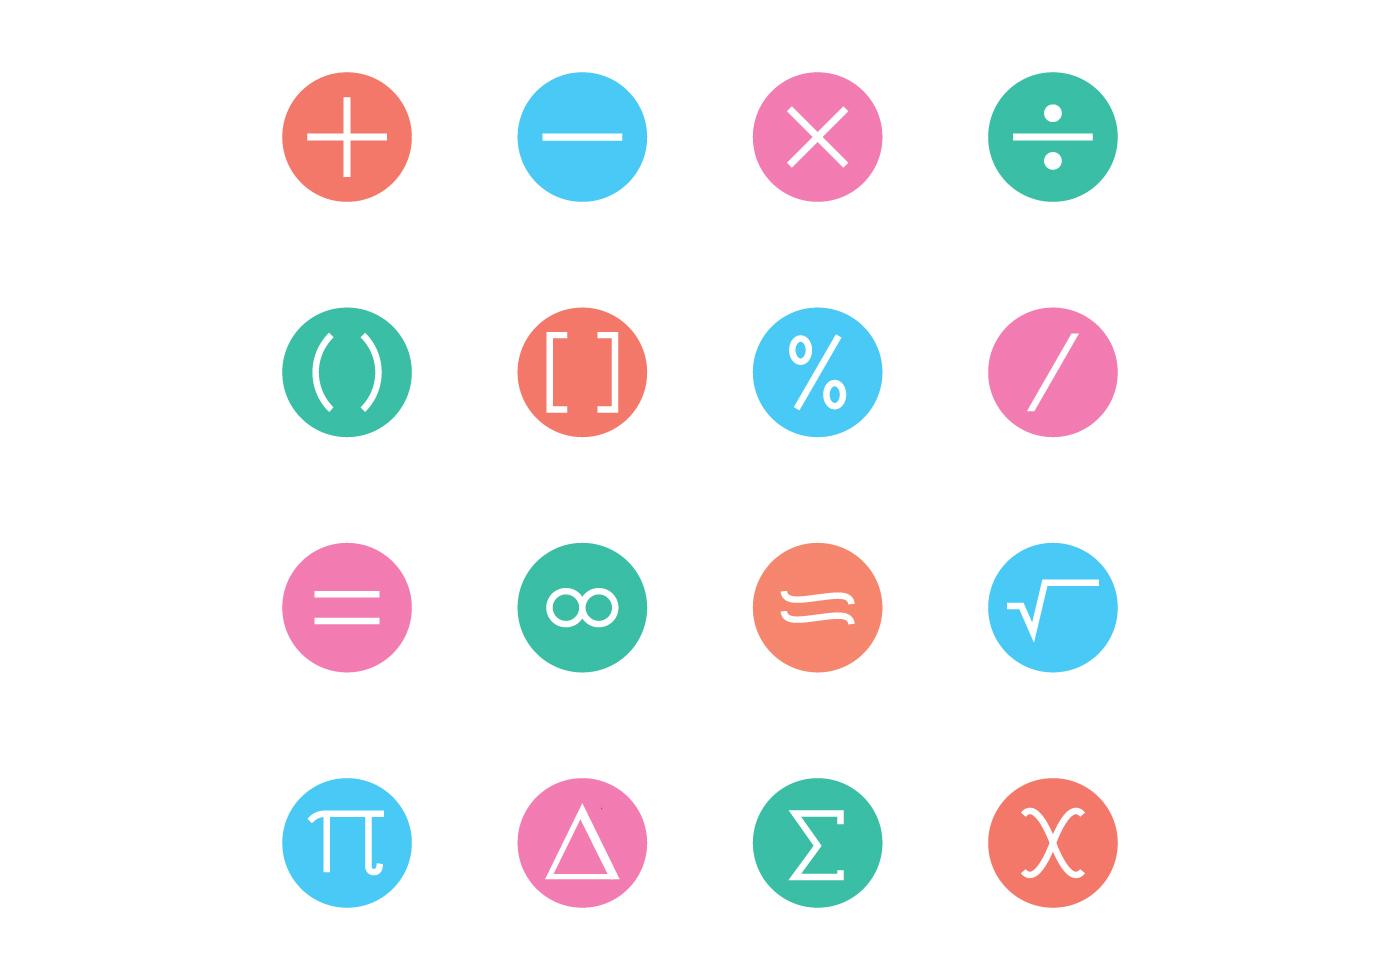 Math symbol icon vectors download free vector art stock graphics math symbol icon vectors download free vector art stock graphics images buycottarizona Image collections